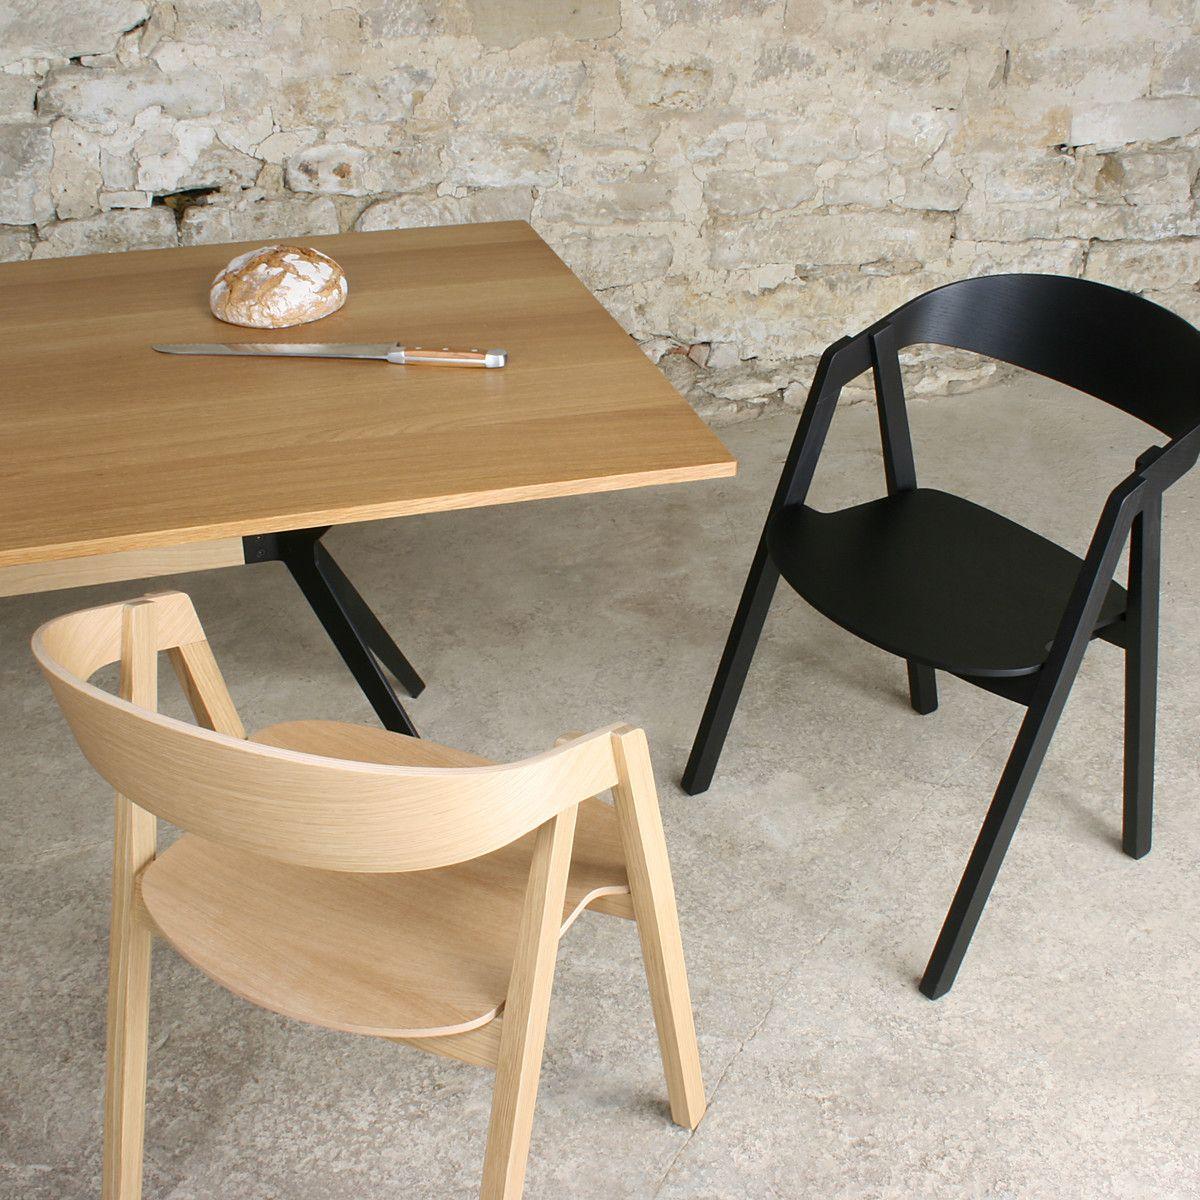 Shaker-tisch-habit-2805_0.jpg (300×226) | möbel | Pinterest | Möbel